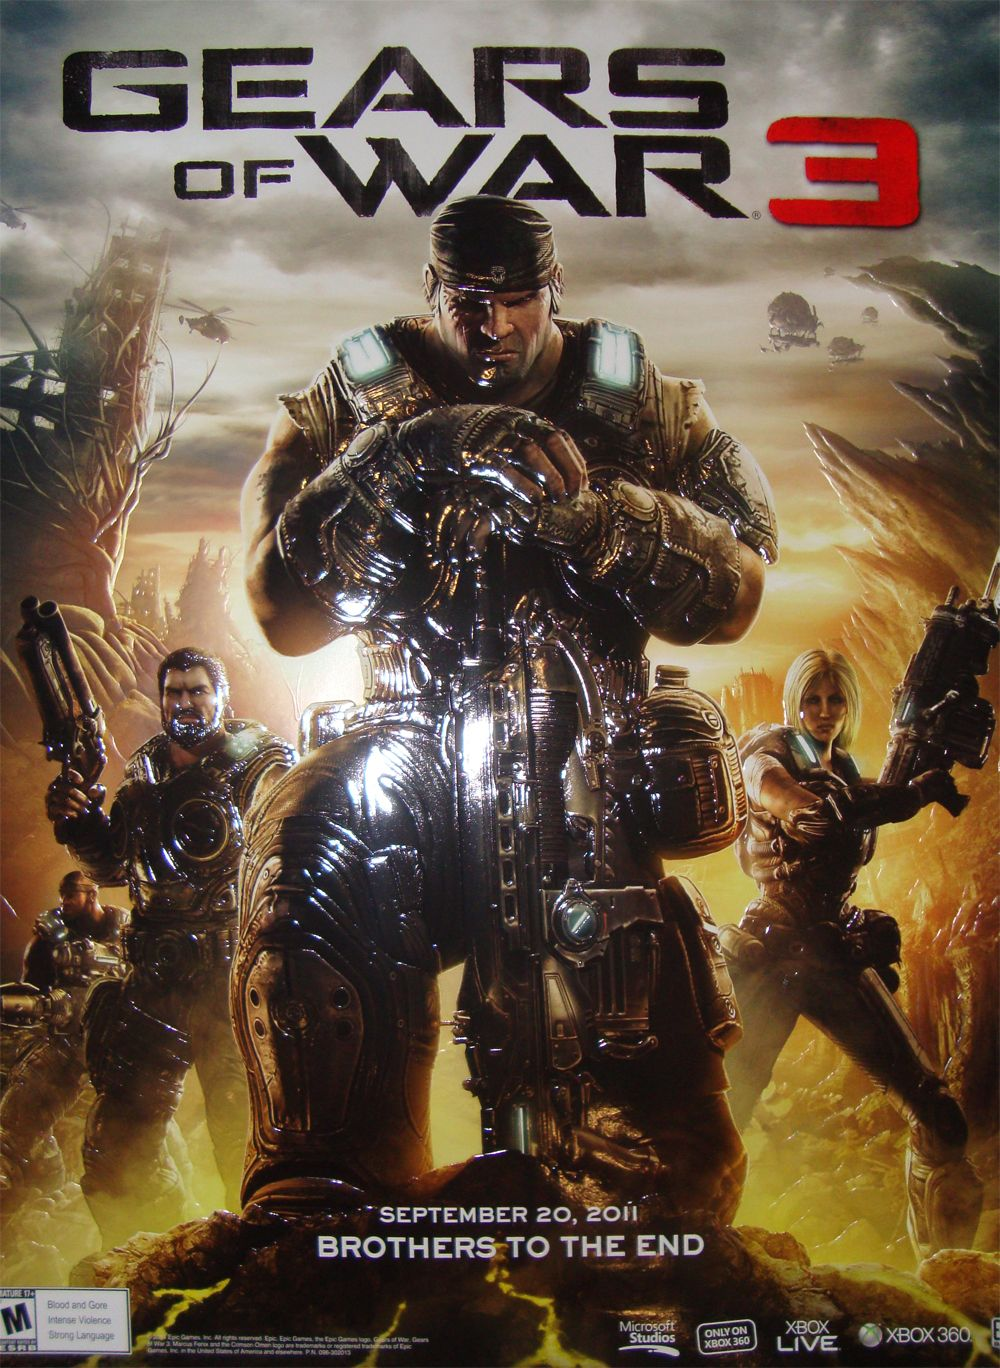 Poster Jpg 1000 1368 Juegos Para Xbox 360 Gears Of War 3 Xbox 360